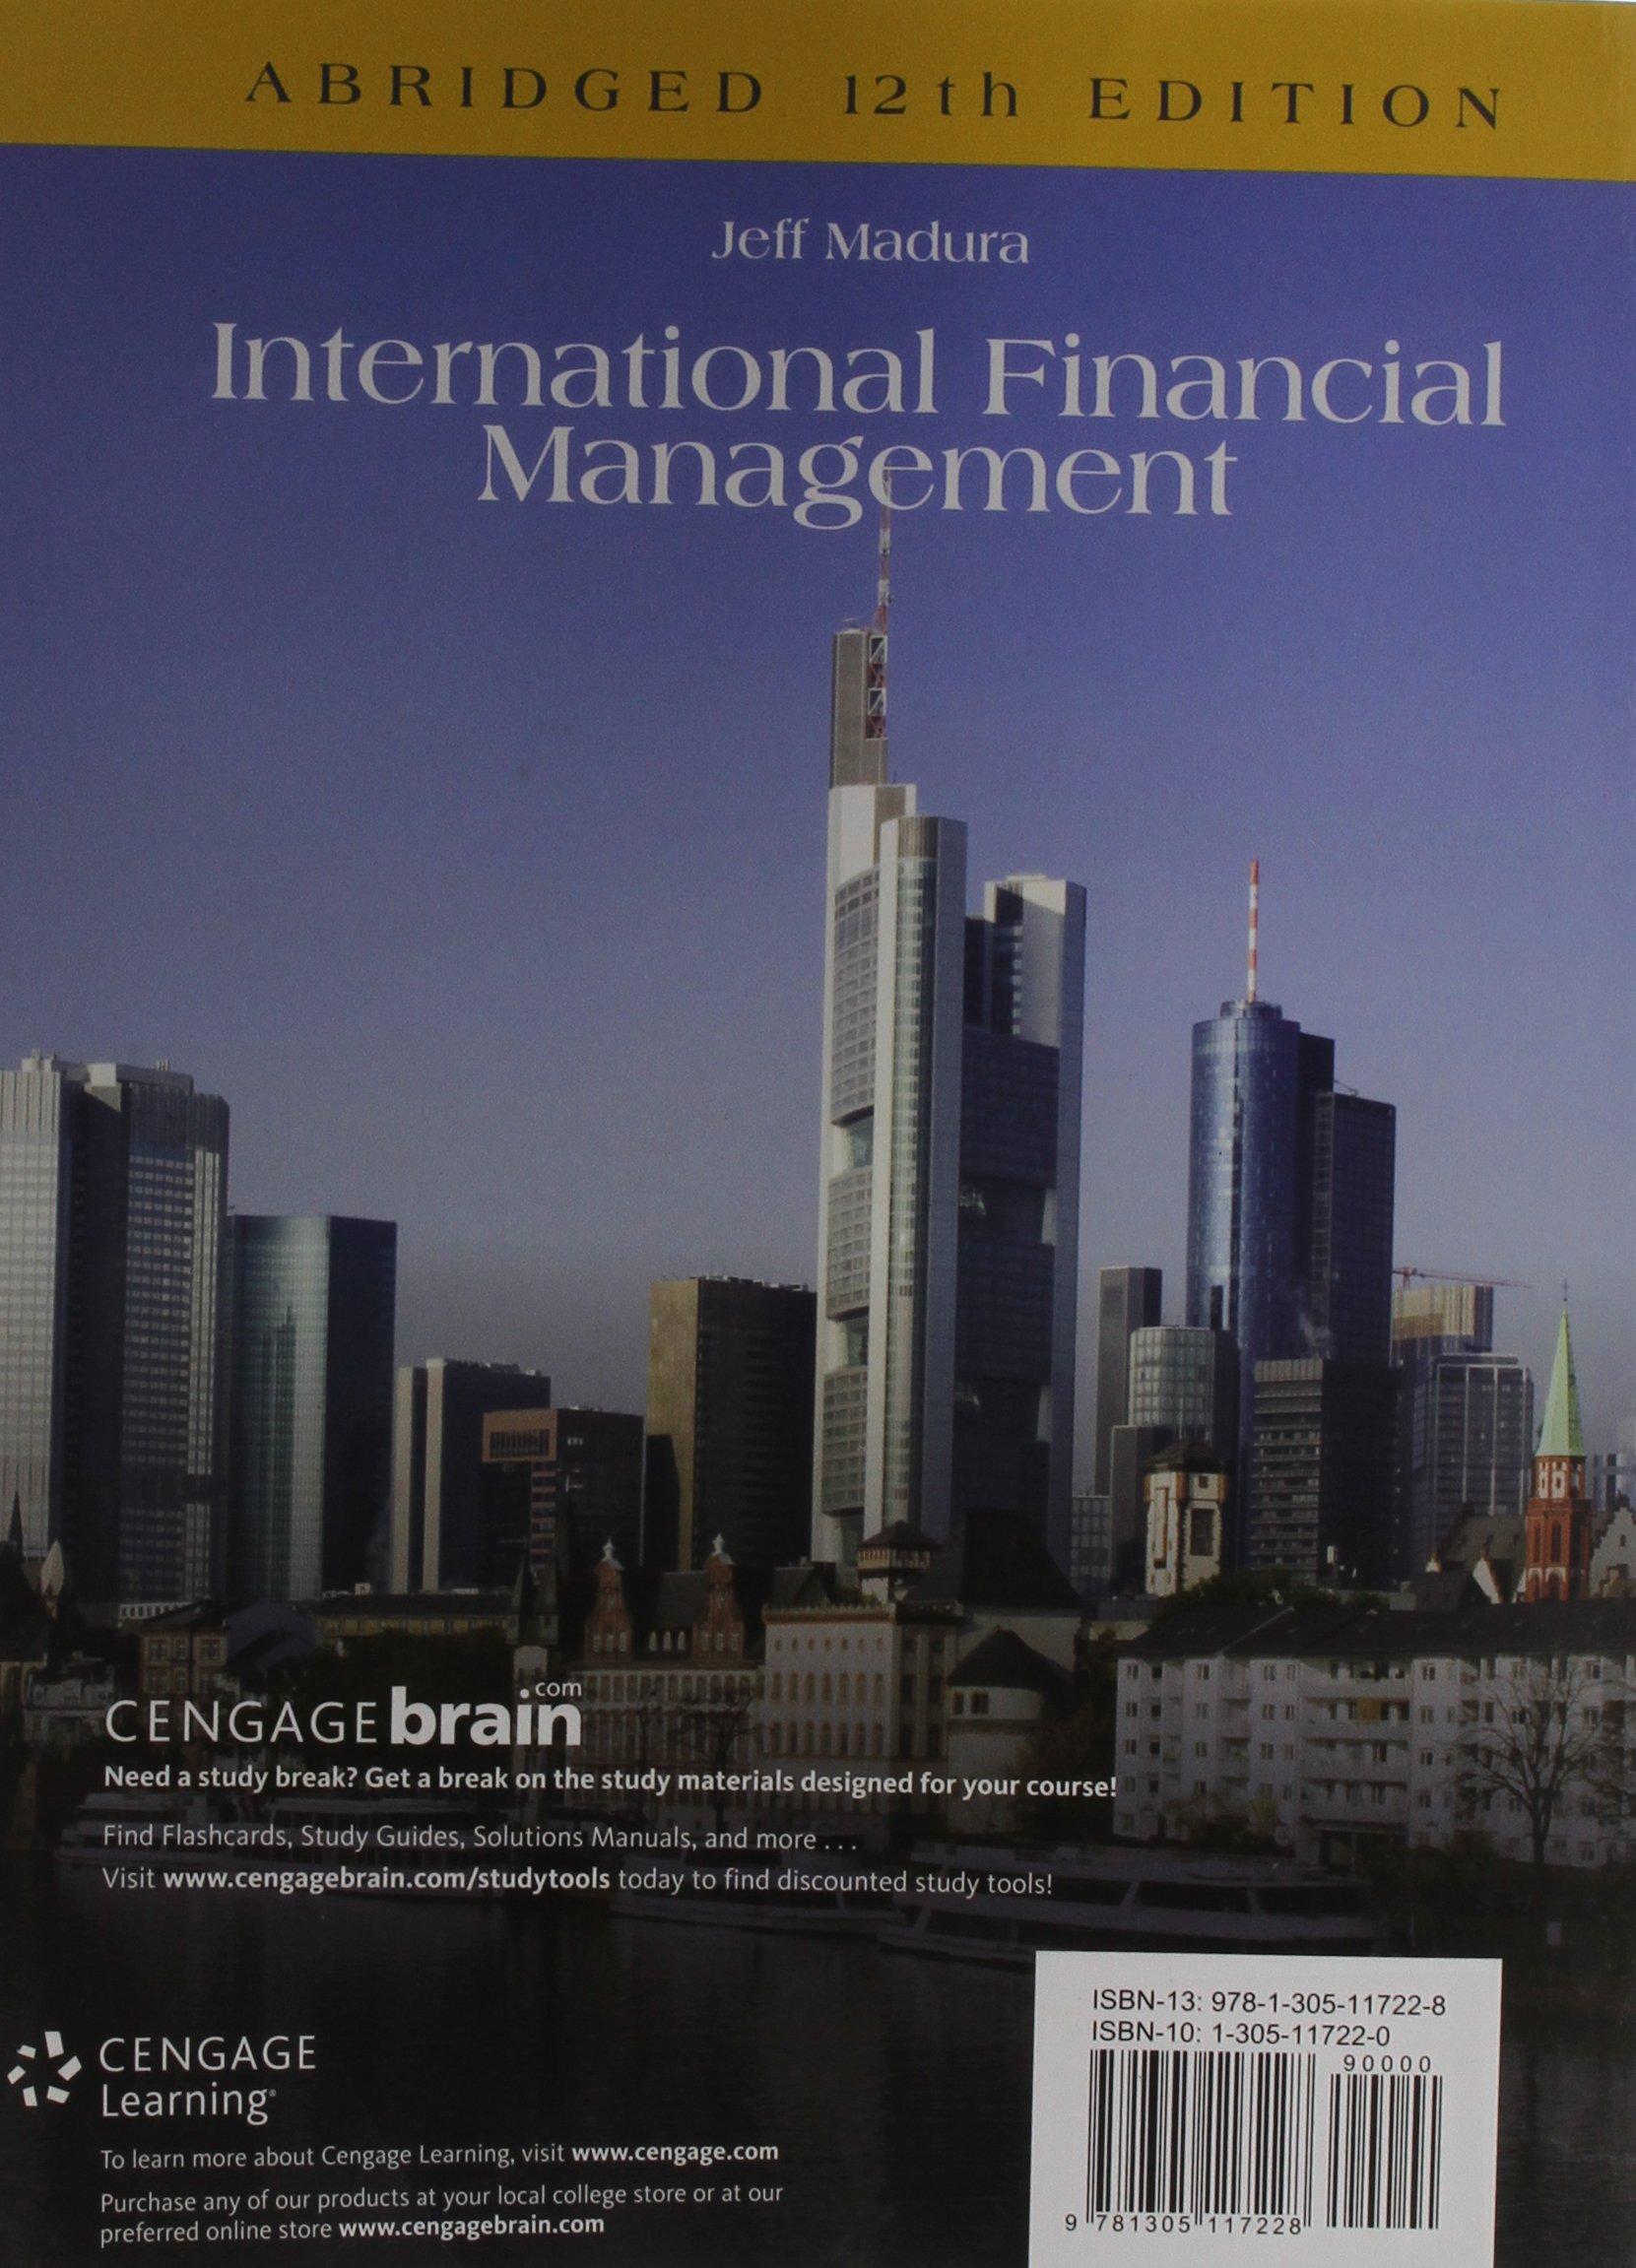 International Financial Management, Abridged by South-Western College Pub